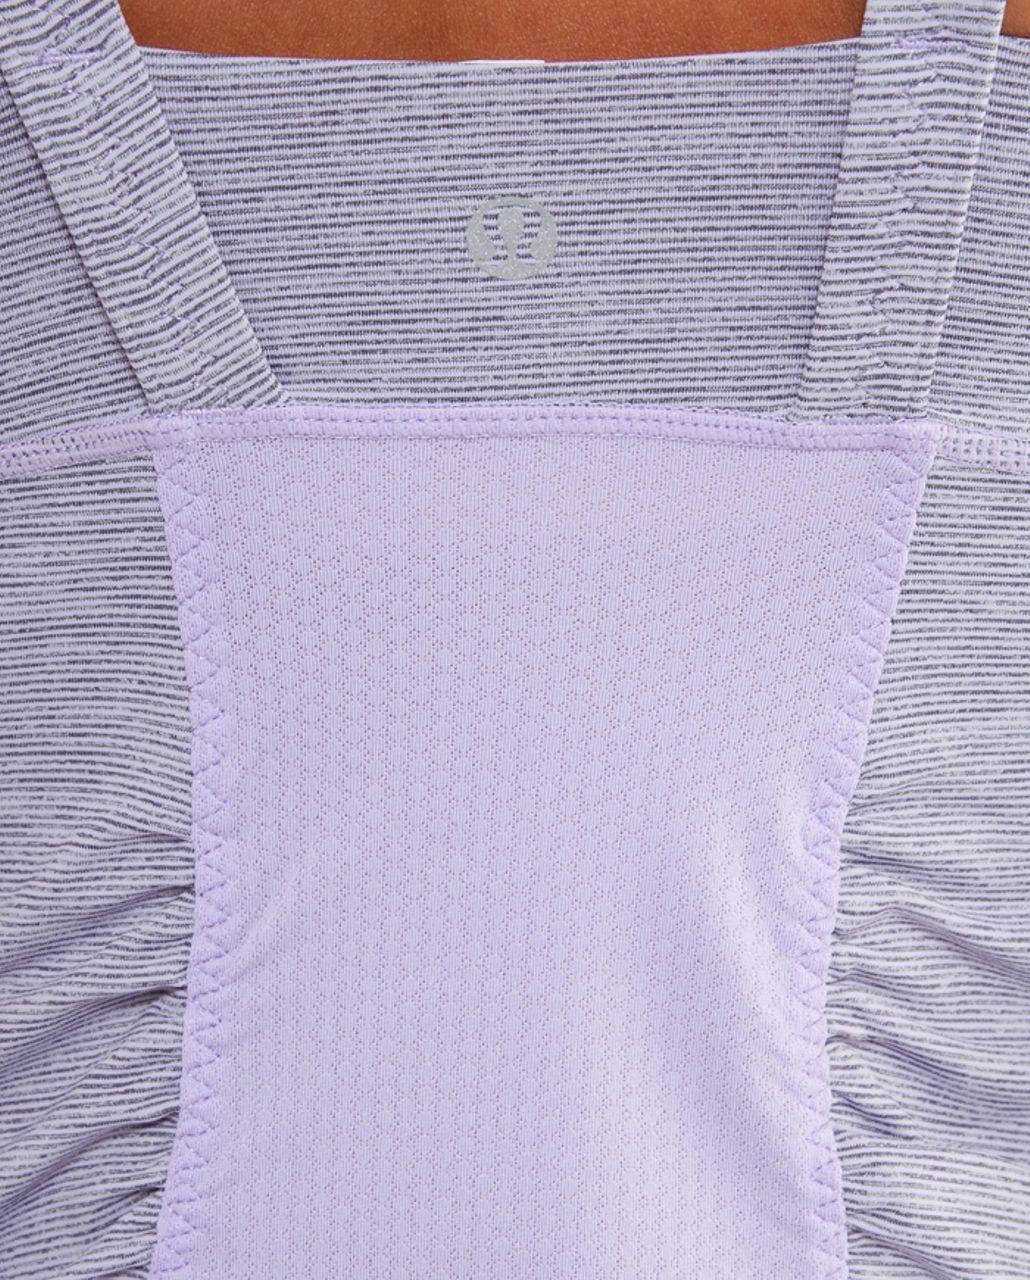 Lululemon Active Strength Tank - Lilac Heathered Coal Wee Stripe /  Lilac